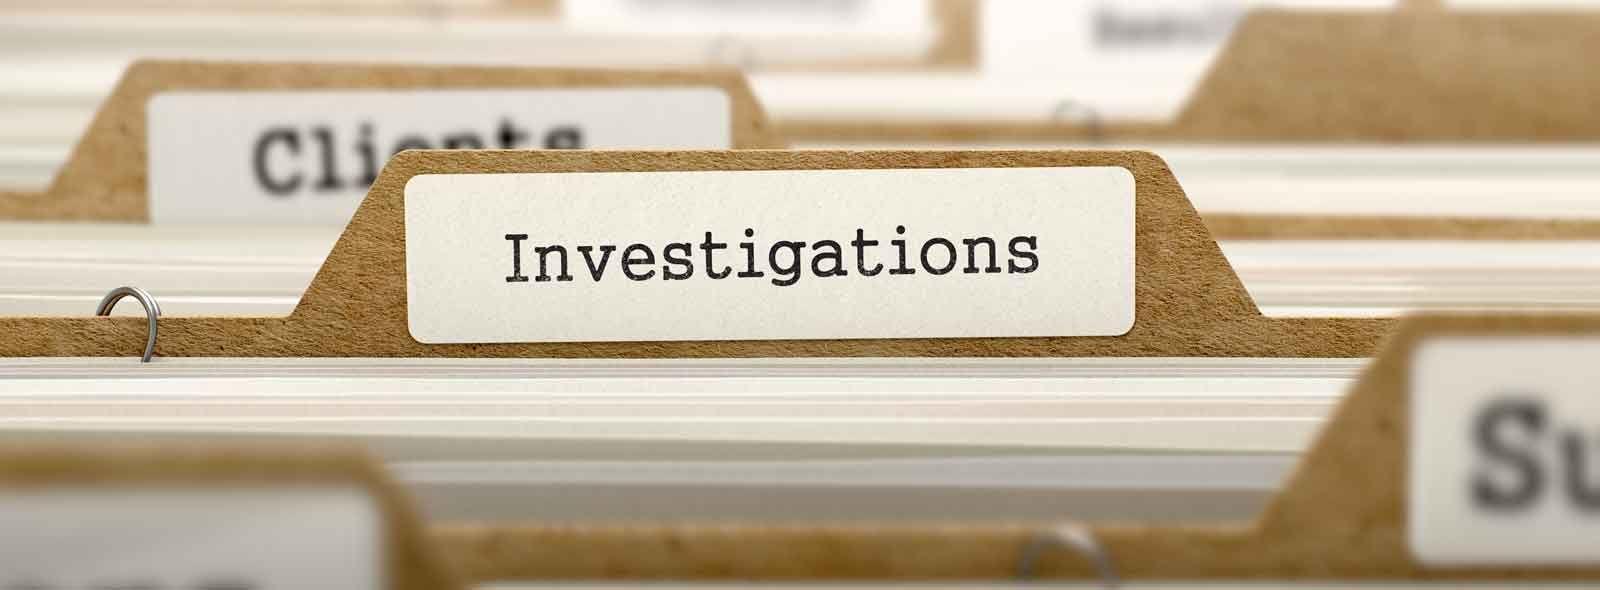 Agenzie investigative Milano